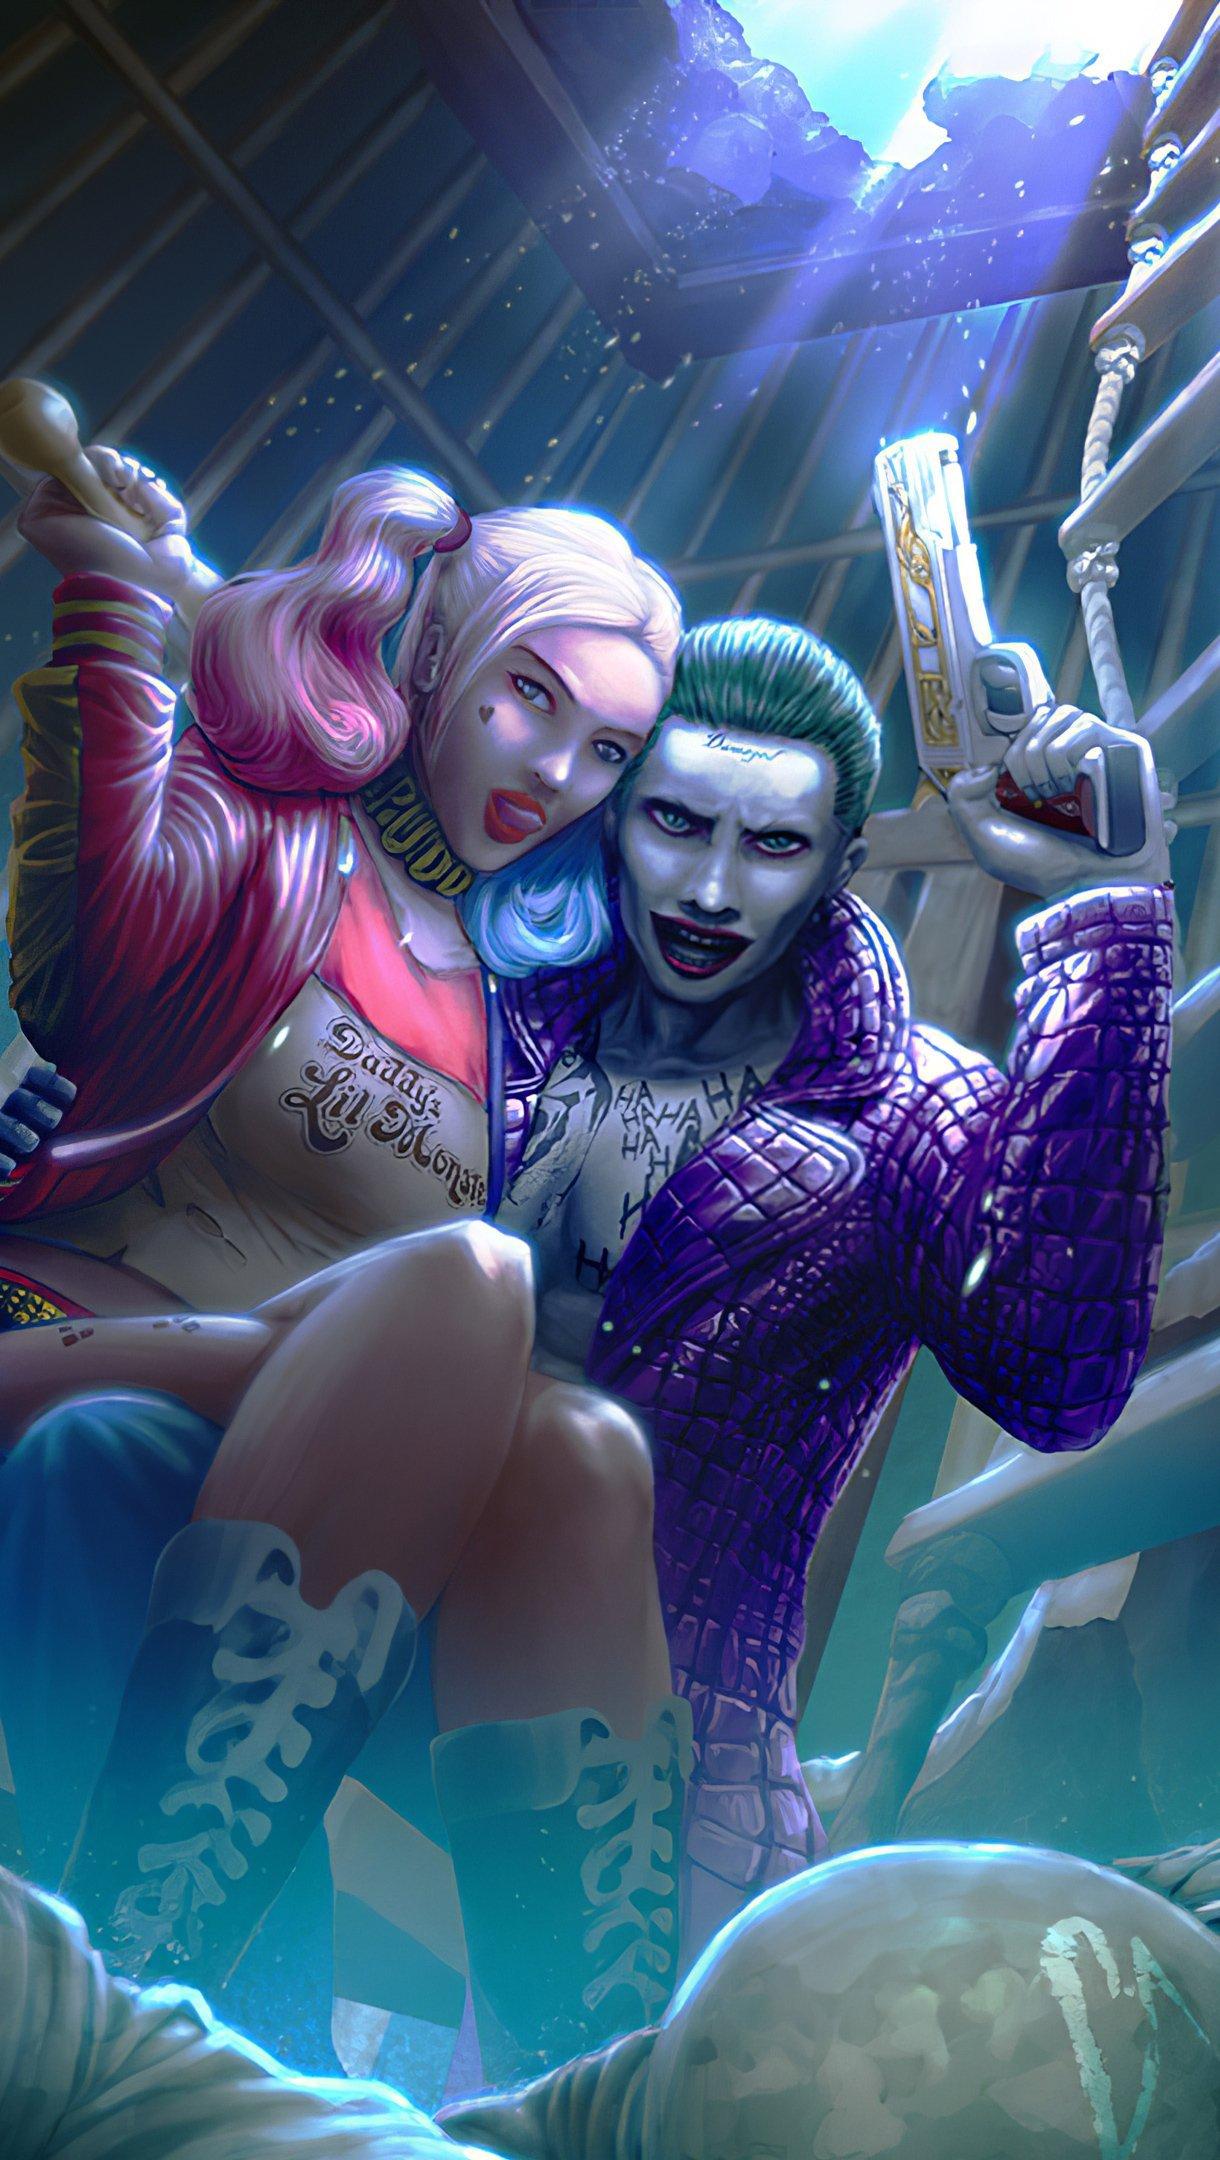 Harley Quinn and Joker Wallpaper 4k Ultra HD ID:4834